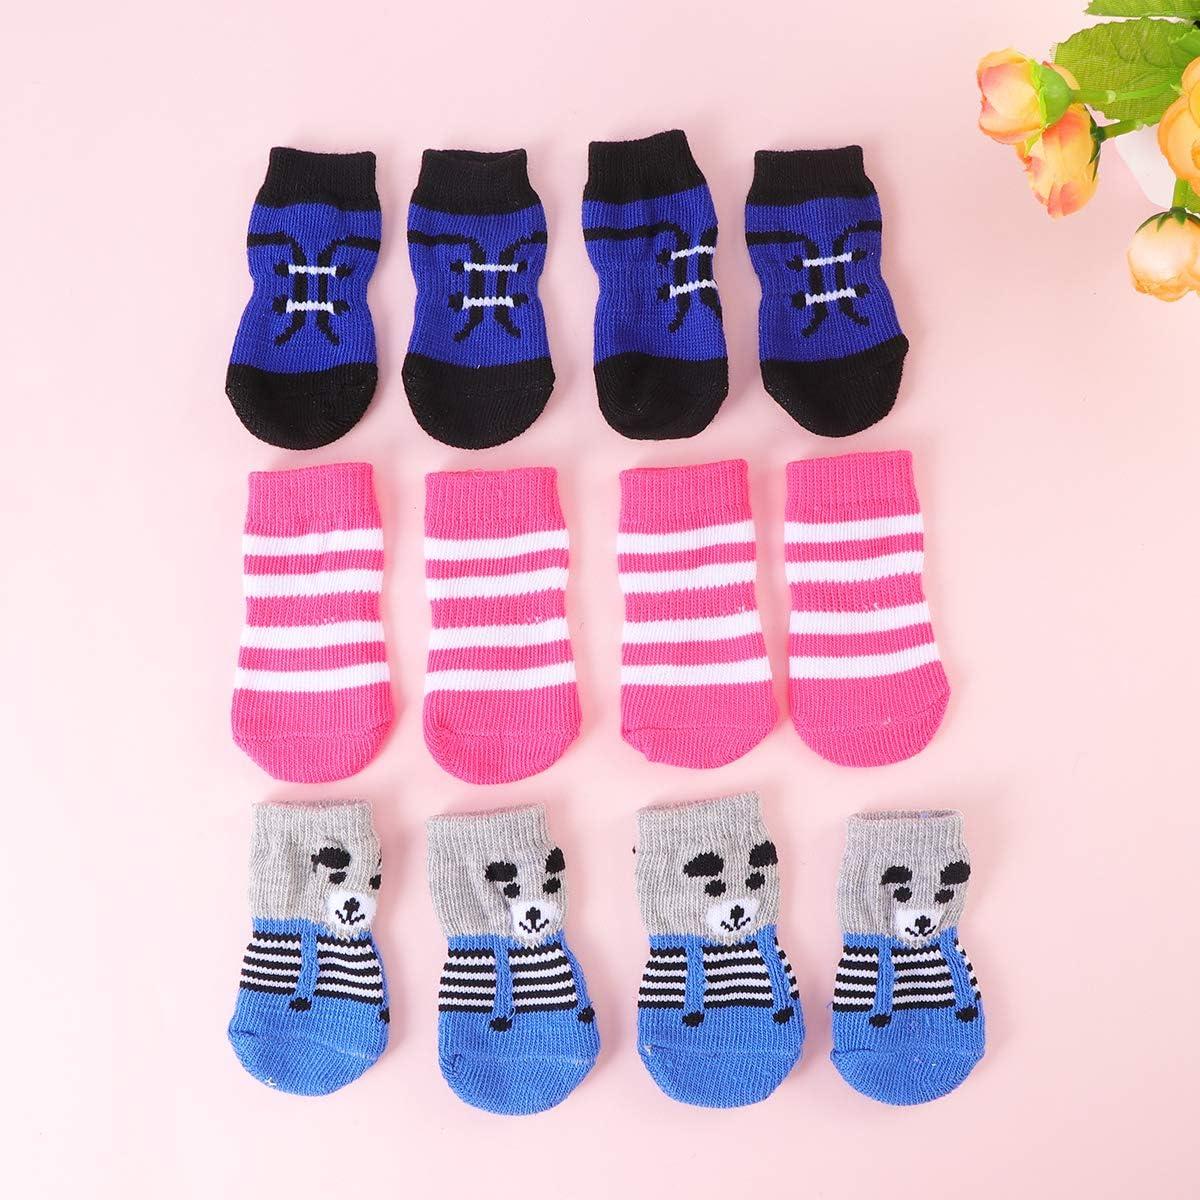 Dog Warm Socks-4PCS Cute Puppy Dogs Pet Knits Socks Anti Slip Cotton Socks Knitting Pet Ankle Sock Random Color Size S